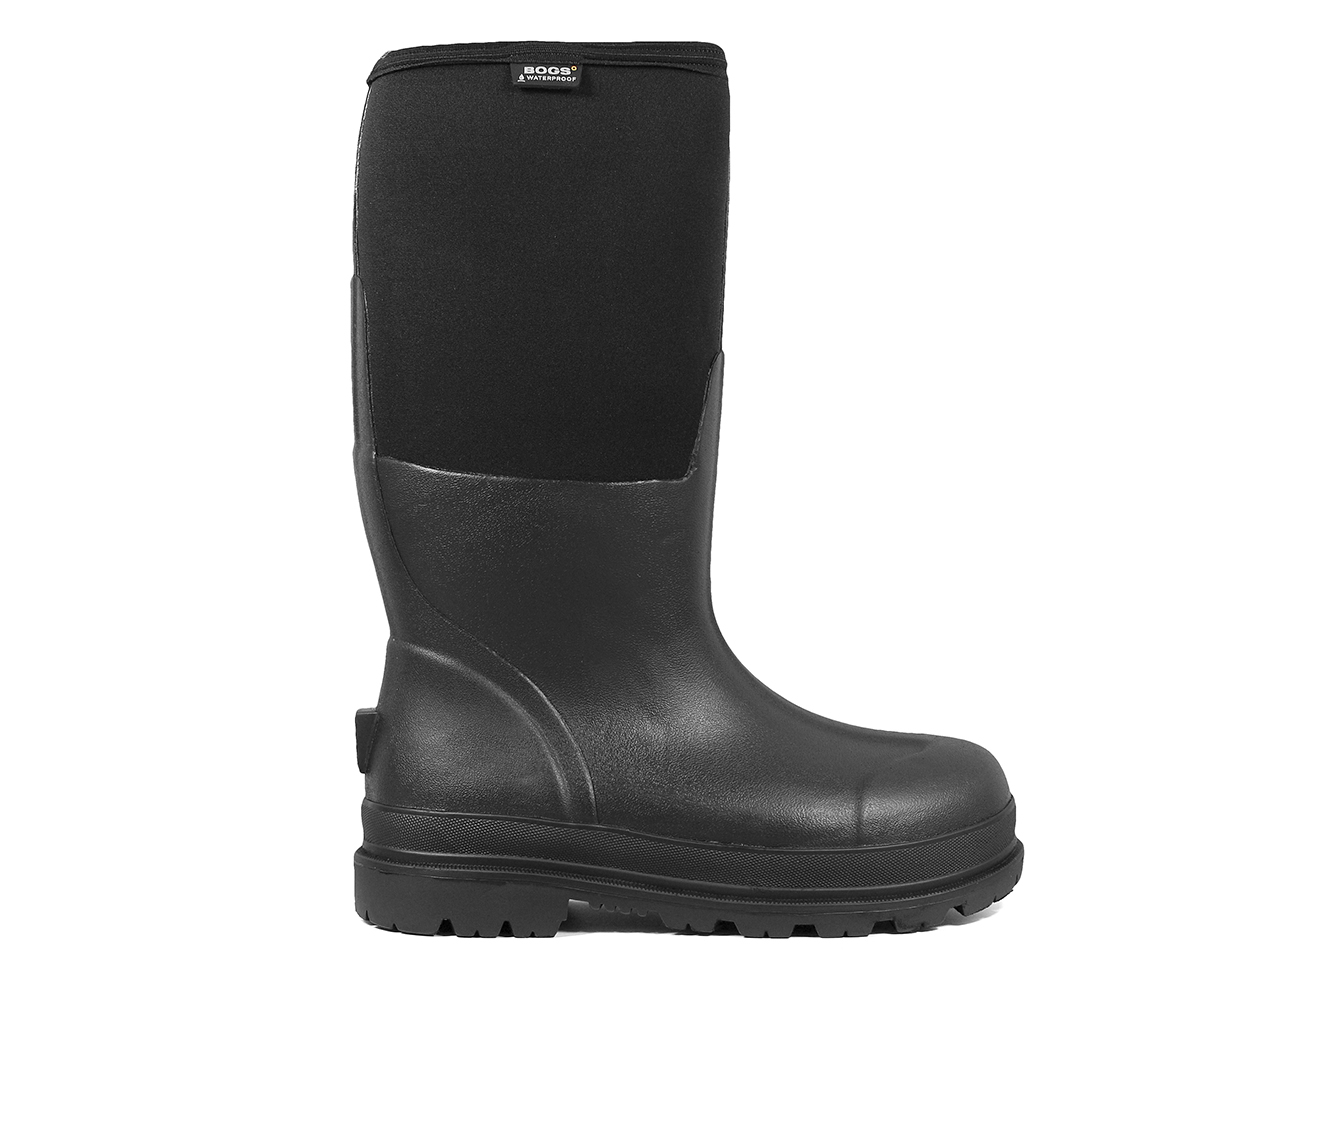 Bogs Footwear Rancher Men's Boots (Black Fabric)